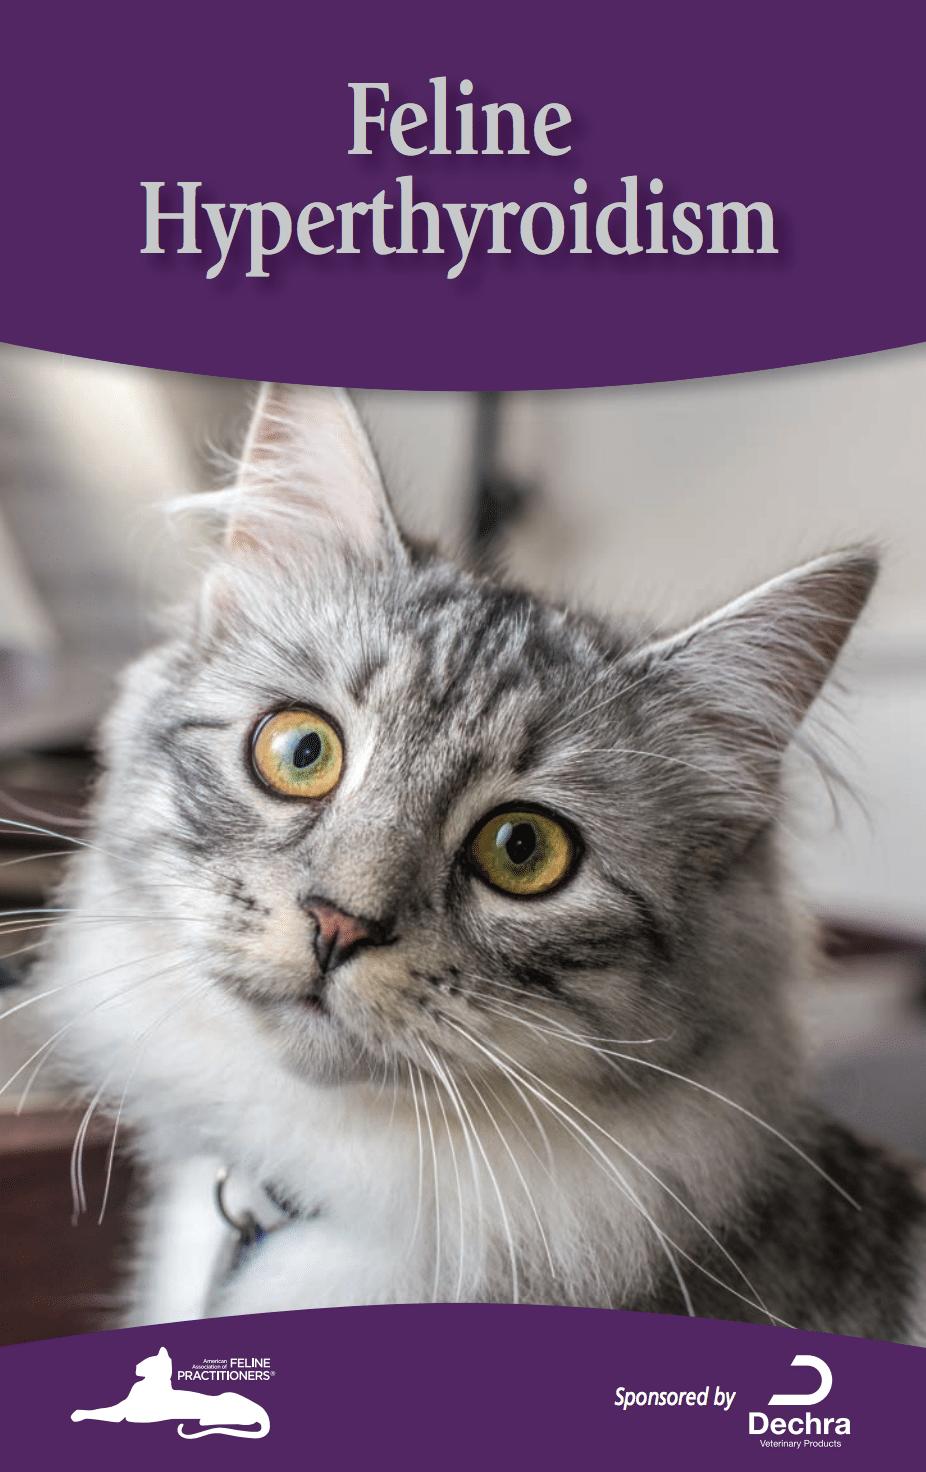 understanding hyperthyroid disease in cats steve dale. Black Bedroom Furniture Sets. Home Design Ideas